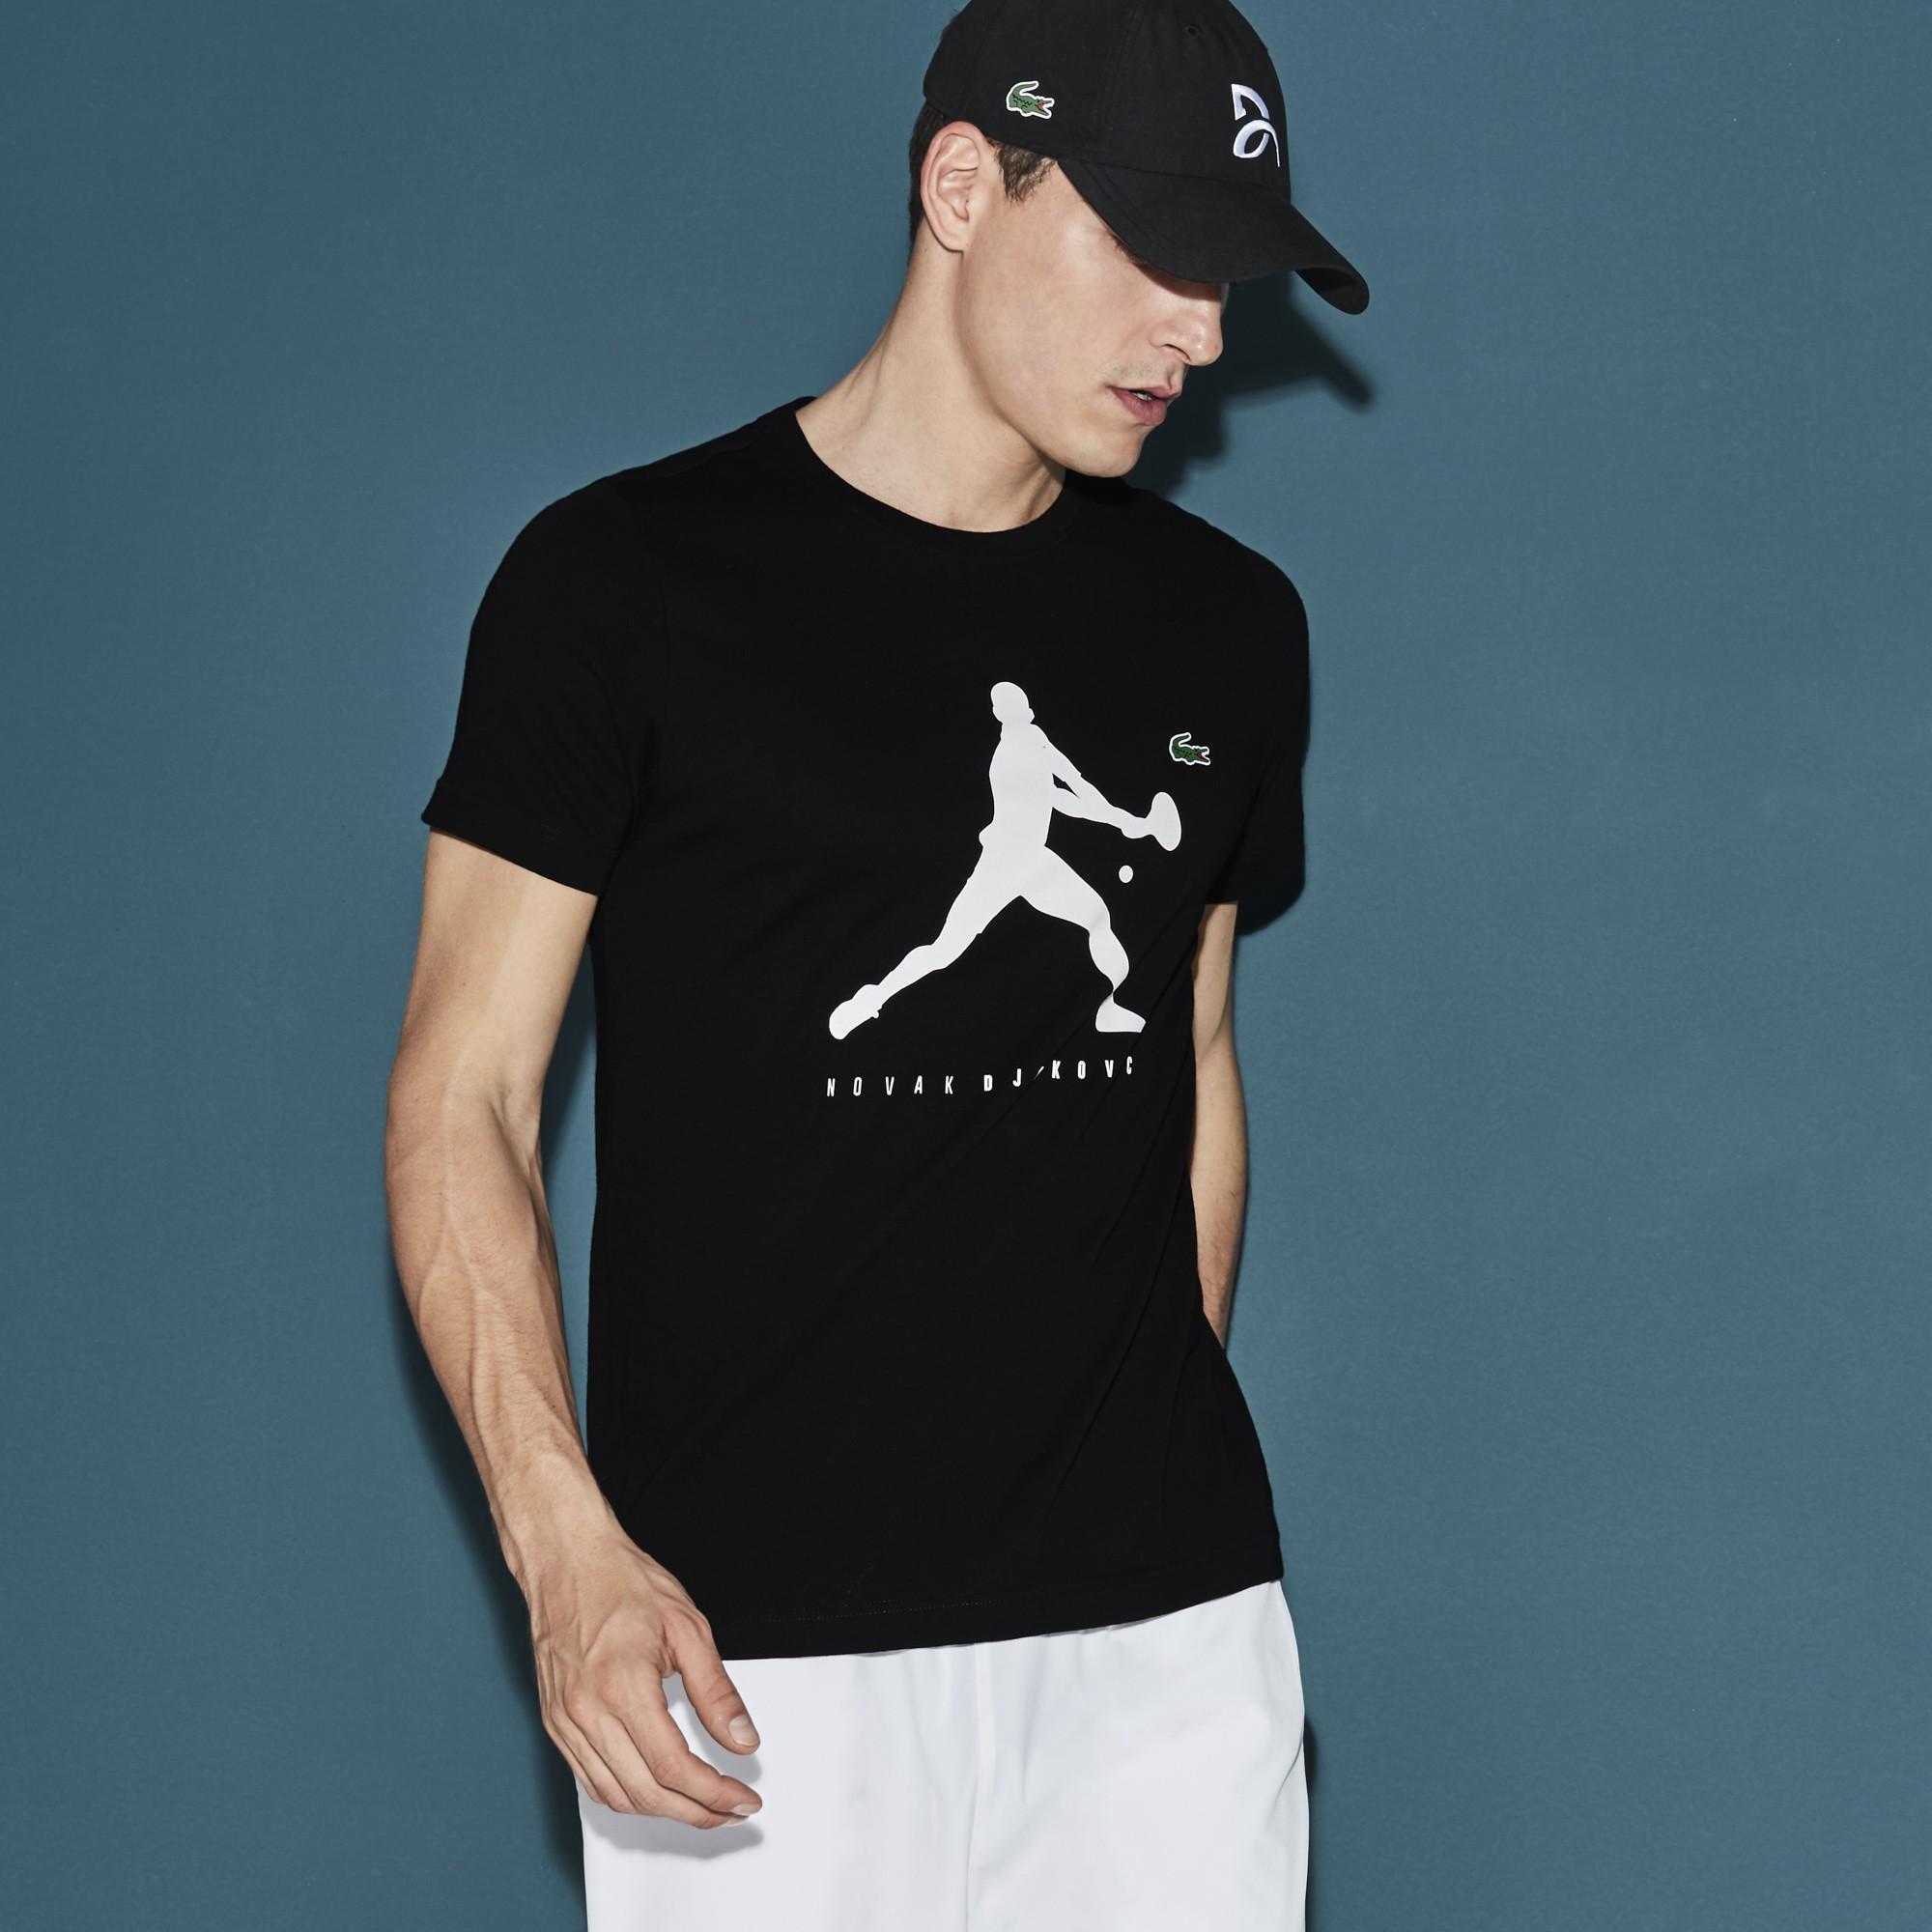 Lacoste Men S Sport Tennis T Shirt Novak Djokovic Supporter Collection In Black Modesens